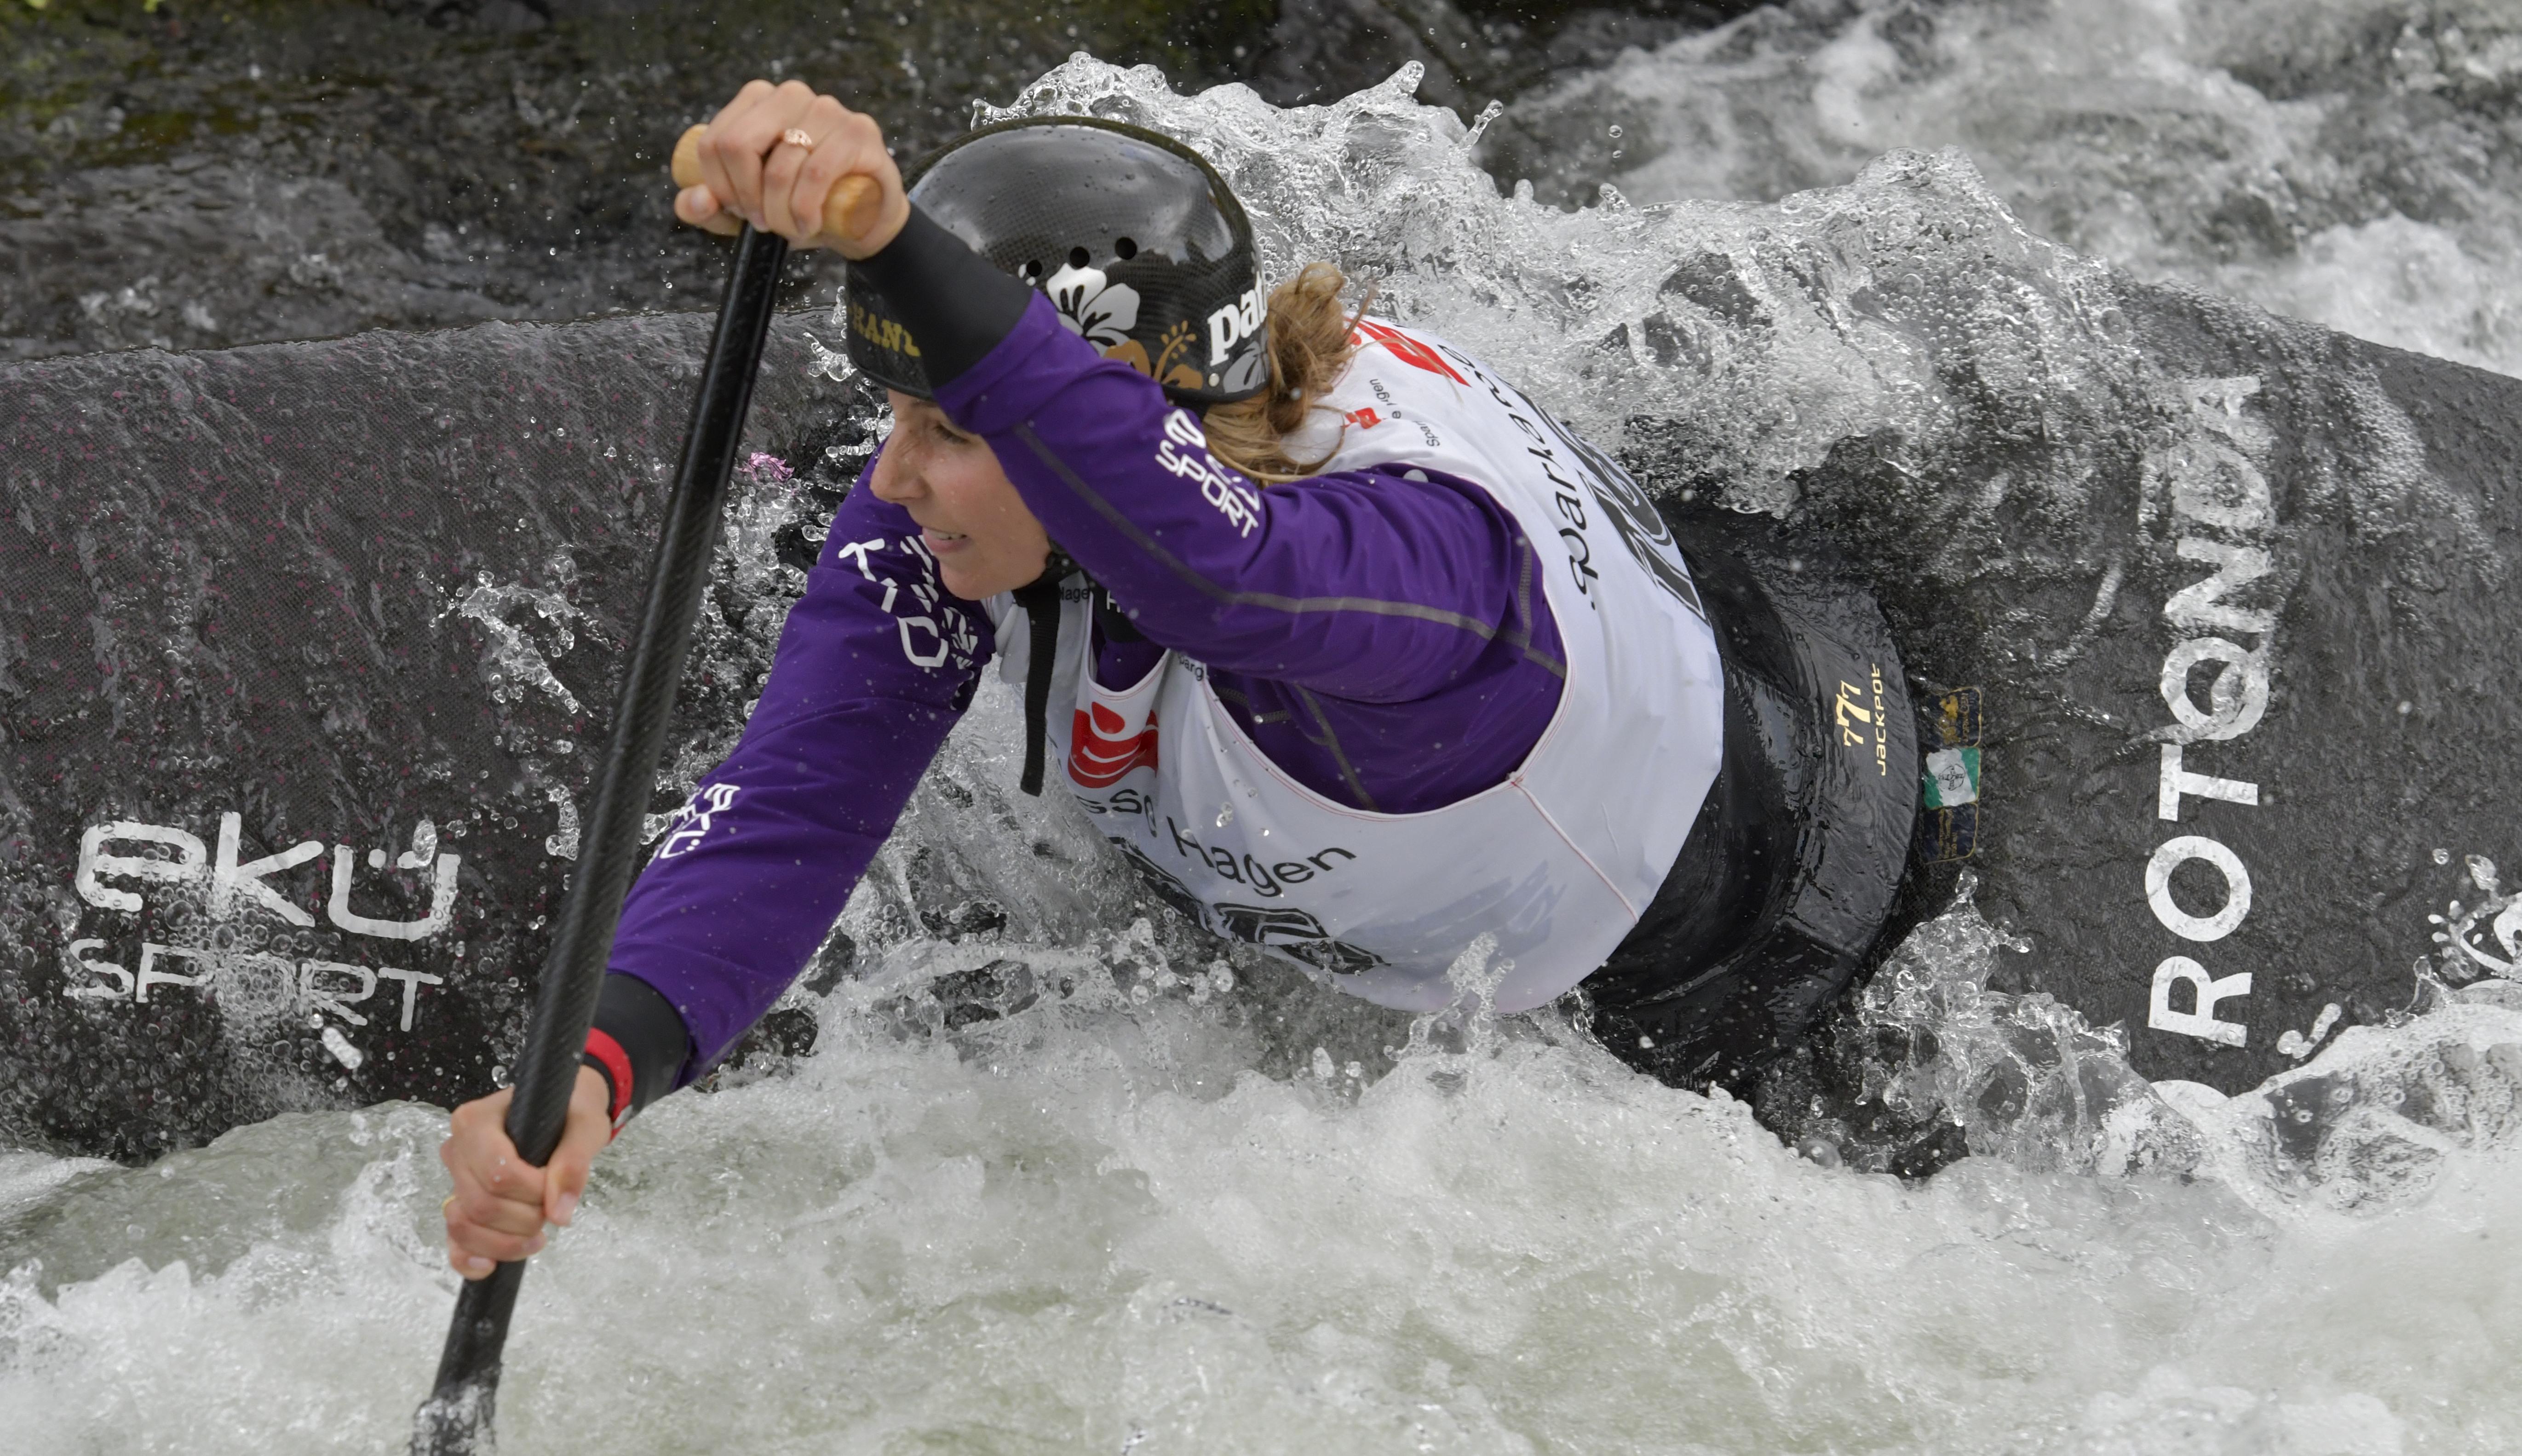 Kanu-Slalom